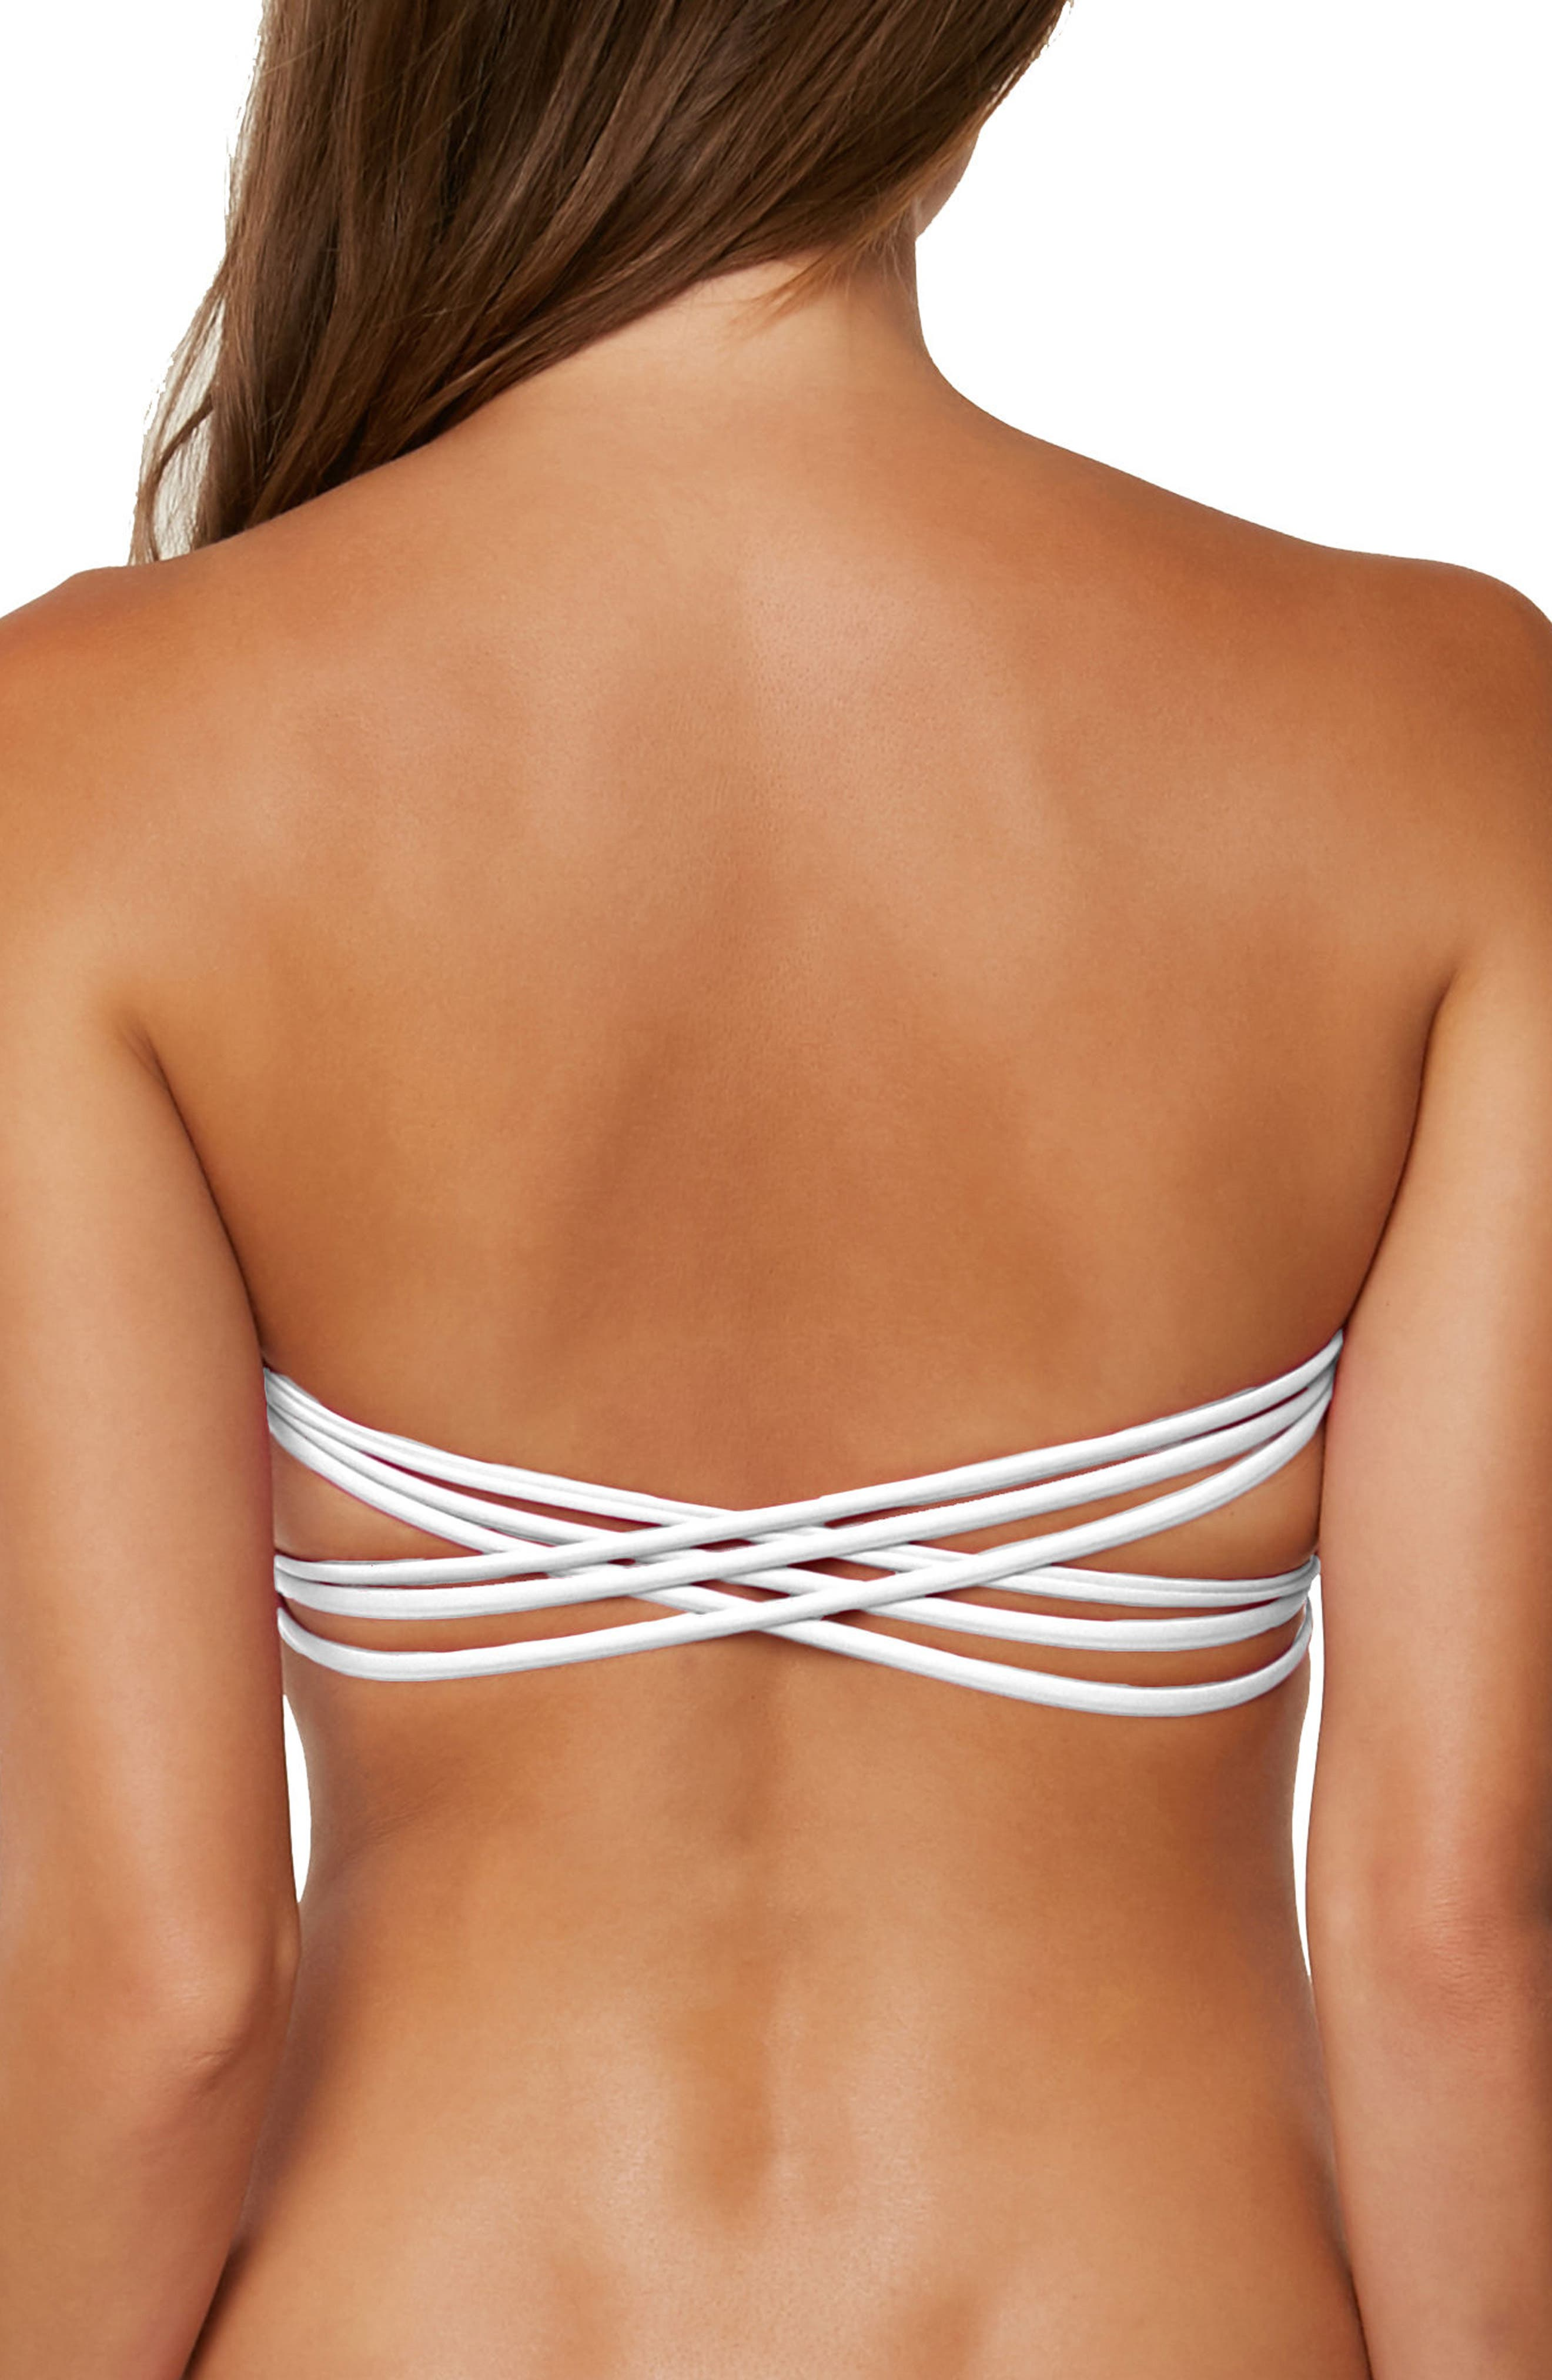 Salt Water Solids Bandeau Bikini Top,                             Alternate thumbnail 2, color,                             White